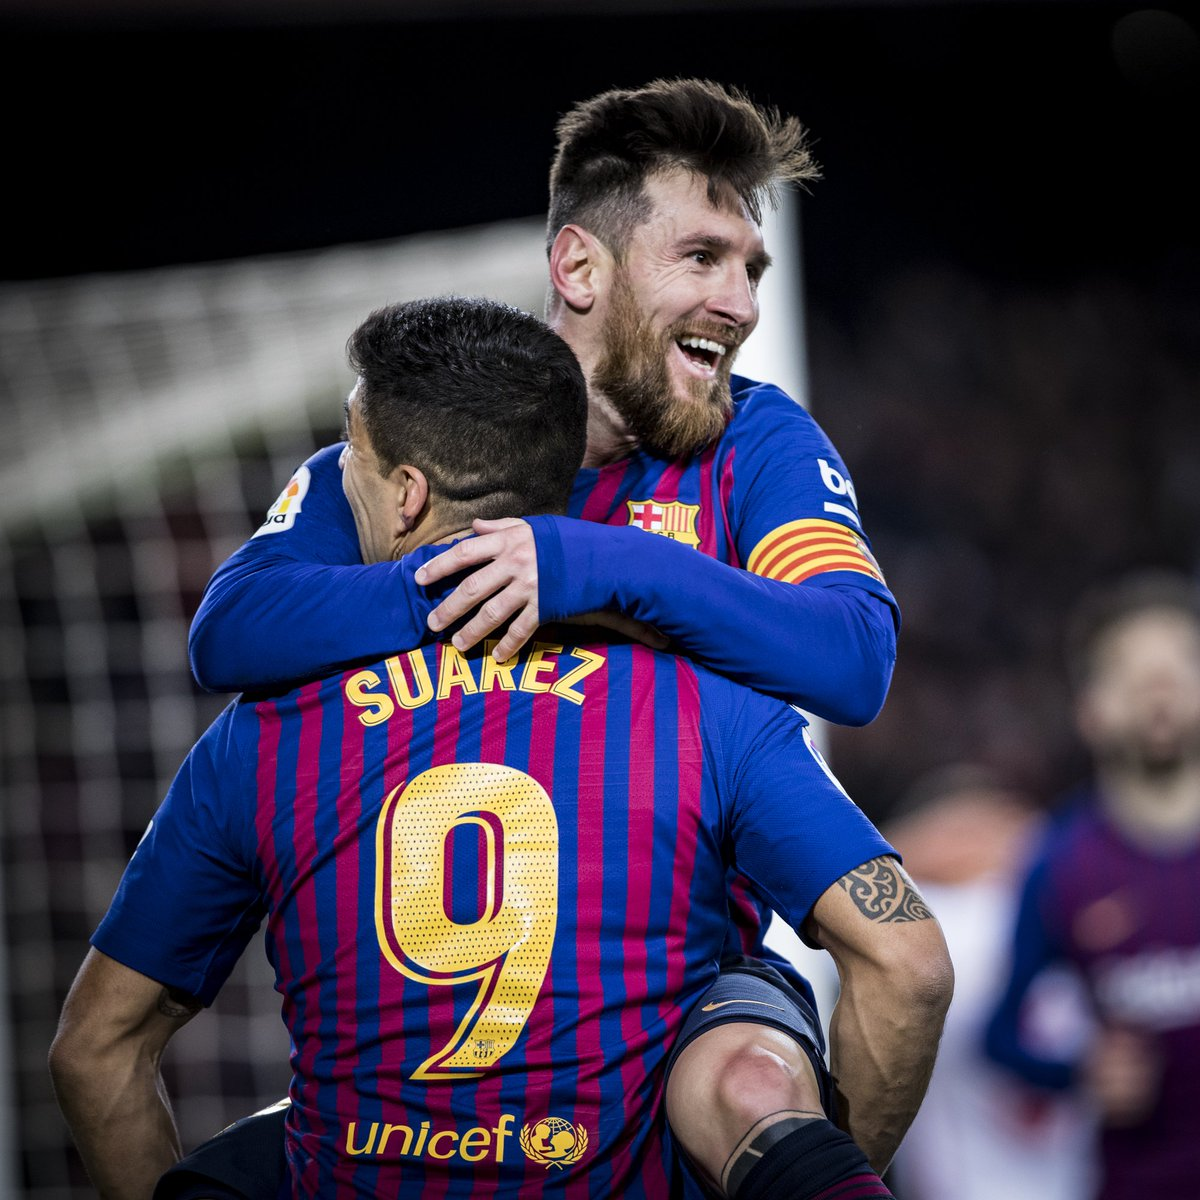 FC Barcelona's photo on Valladolid